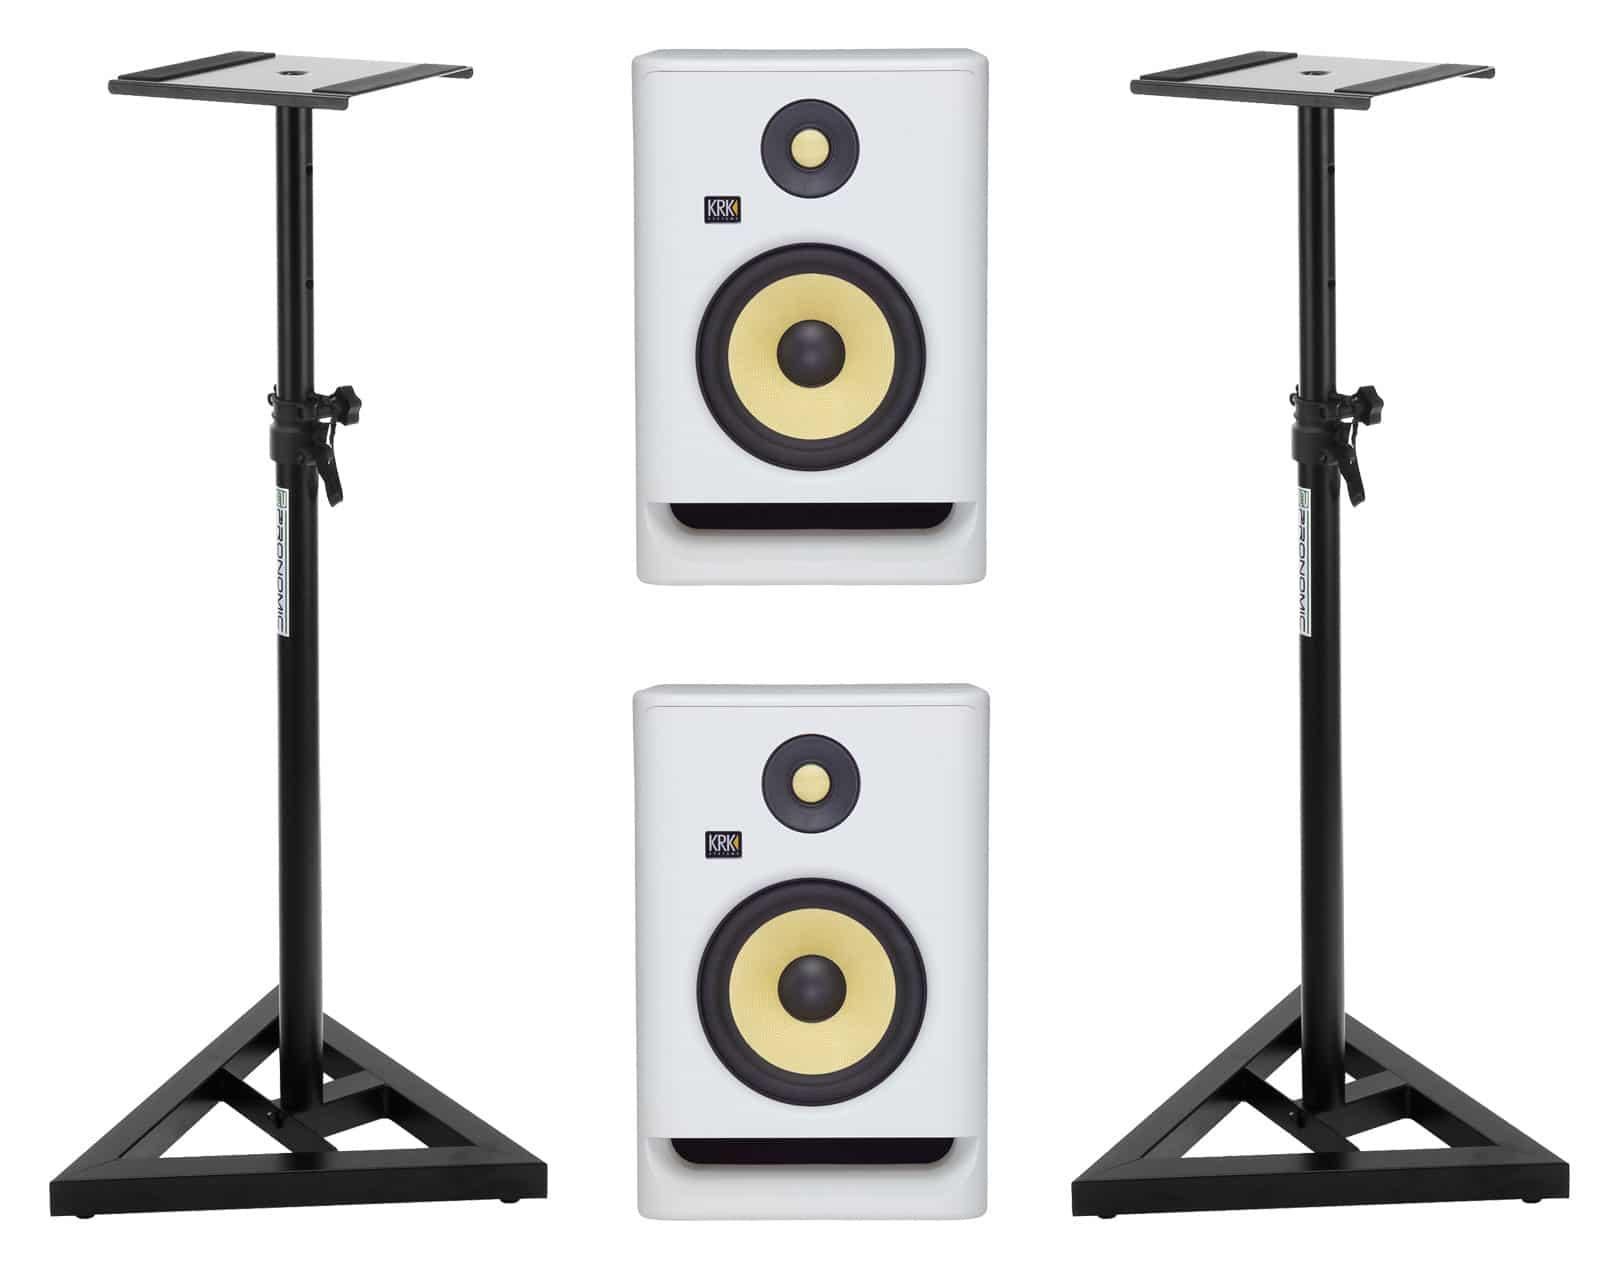 Studiomonitore - KRK ROKIT RP7 G4 White Noise Stativ Set - Onlineshop Musikhaus Kirstein